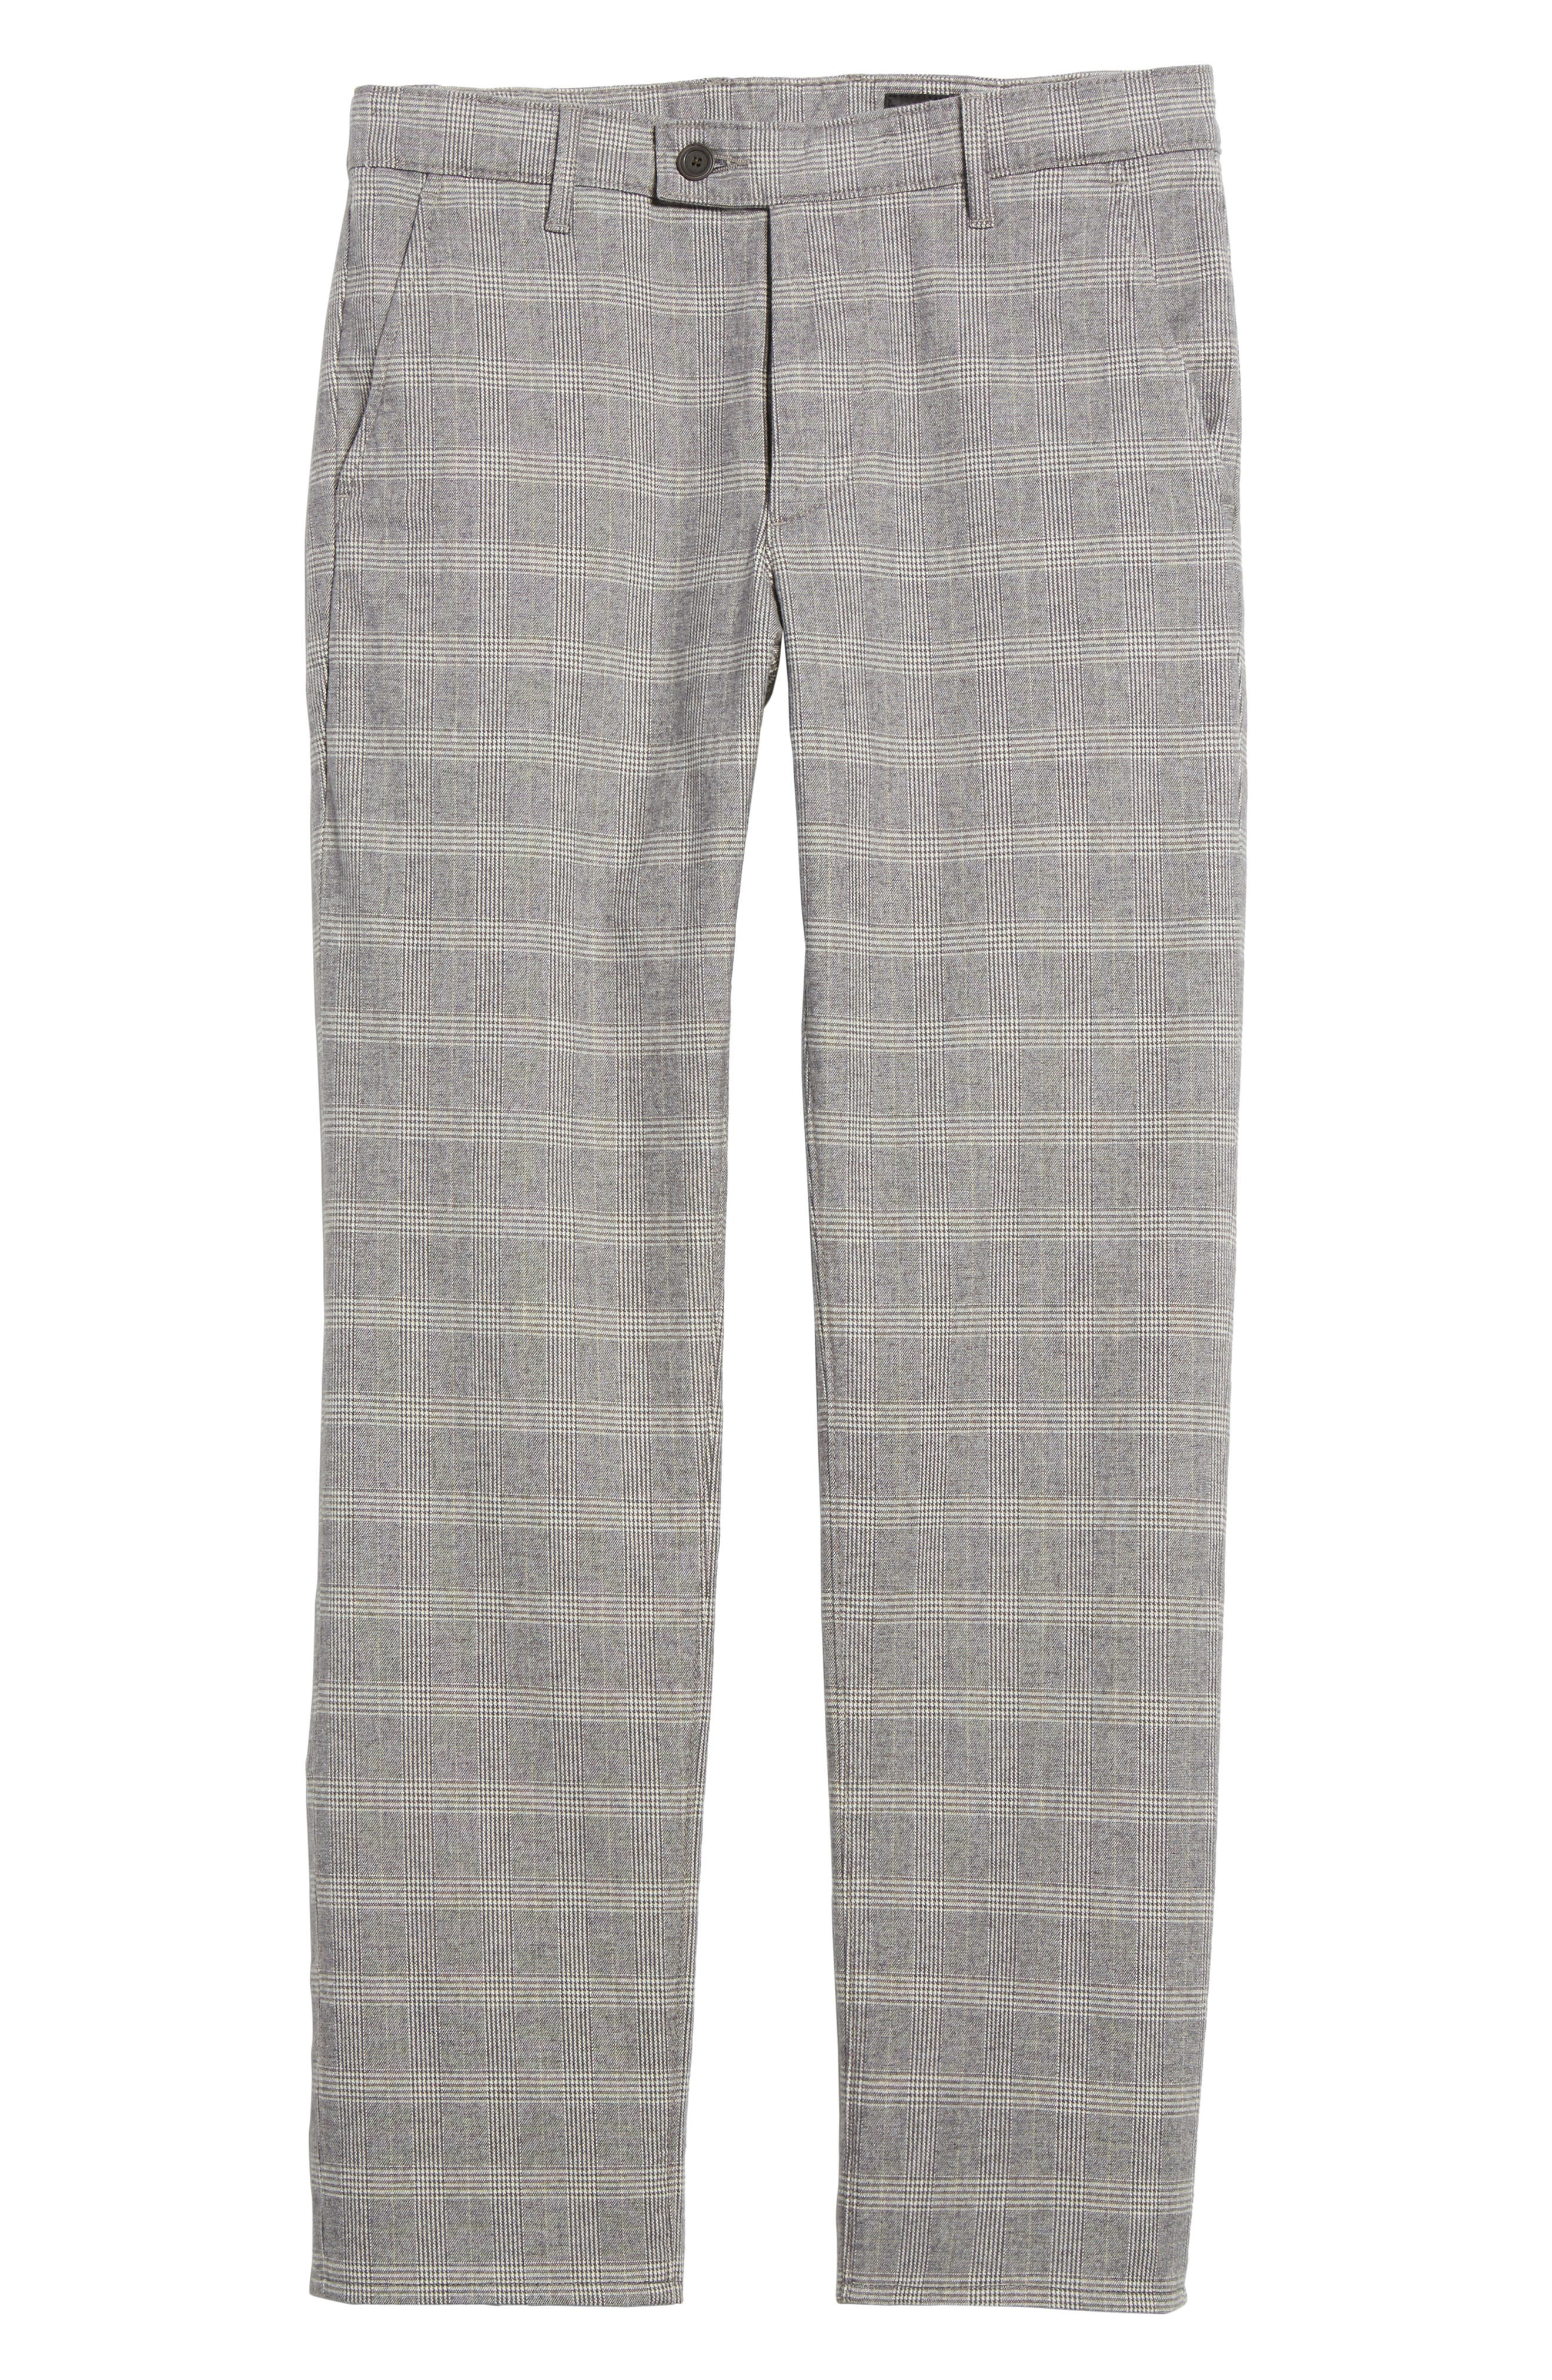 Marshall Slim Fit Pants,                             Alternate thumbnail 6, color,                             250